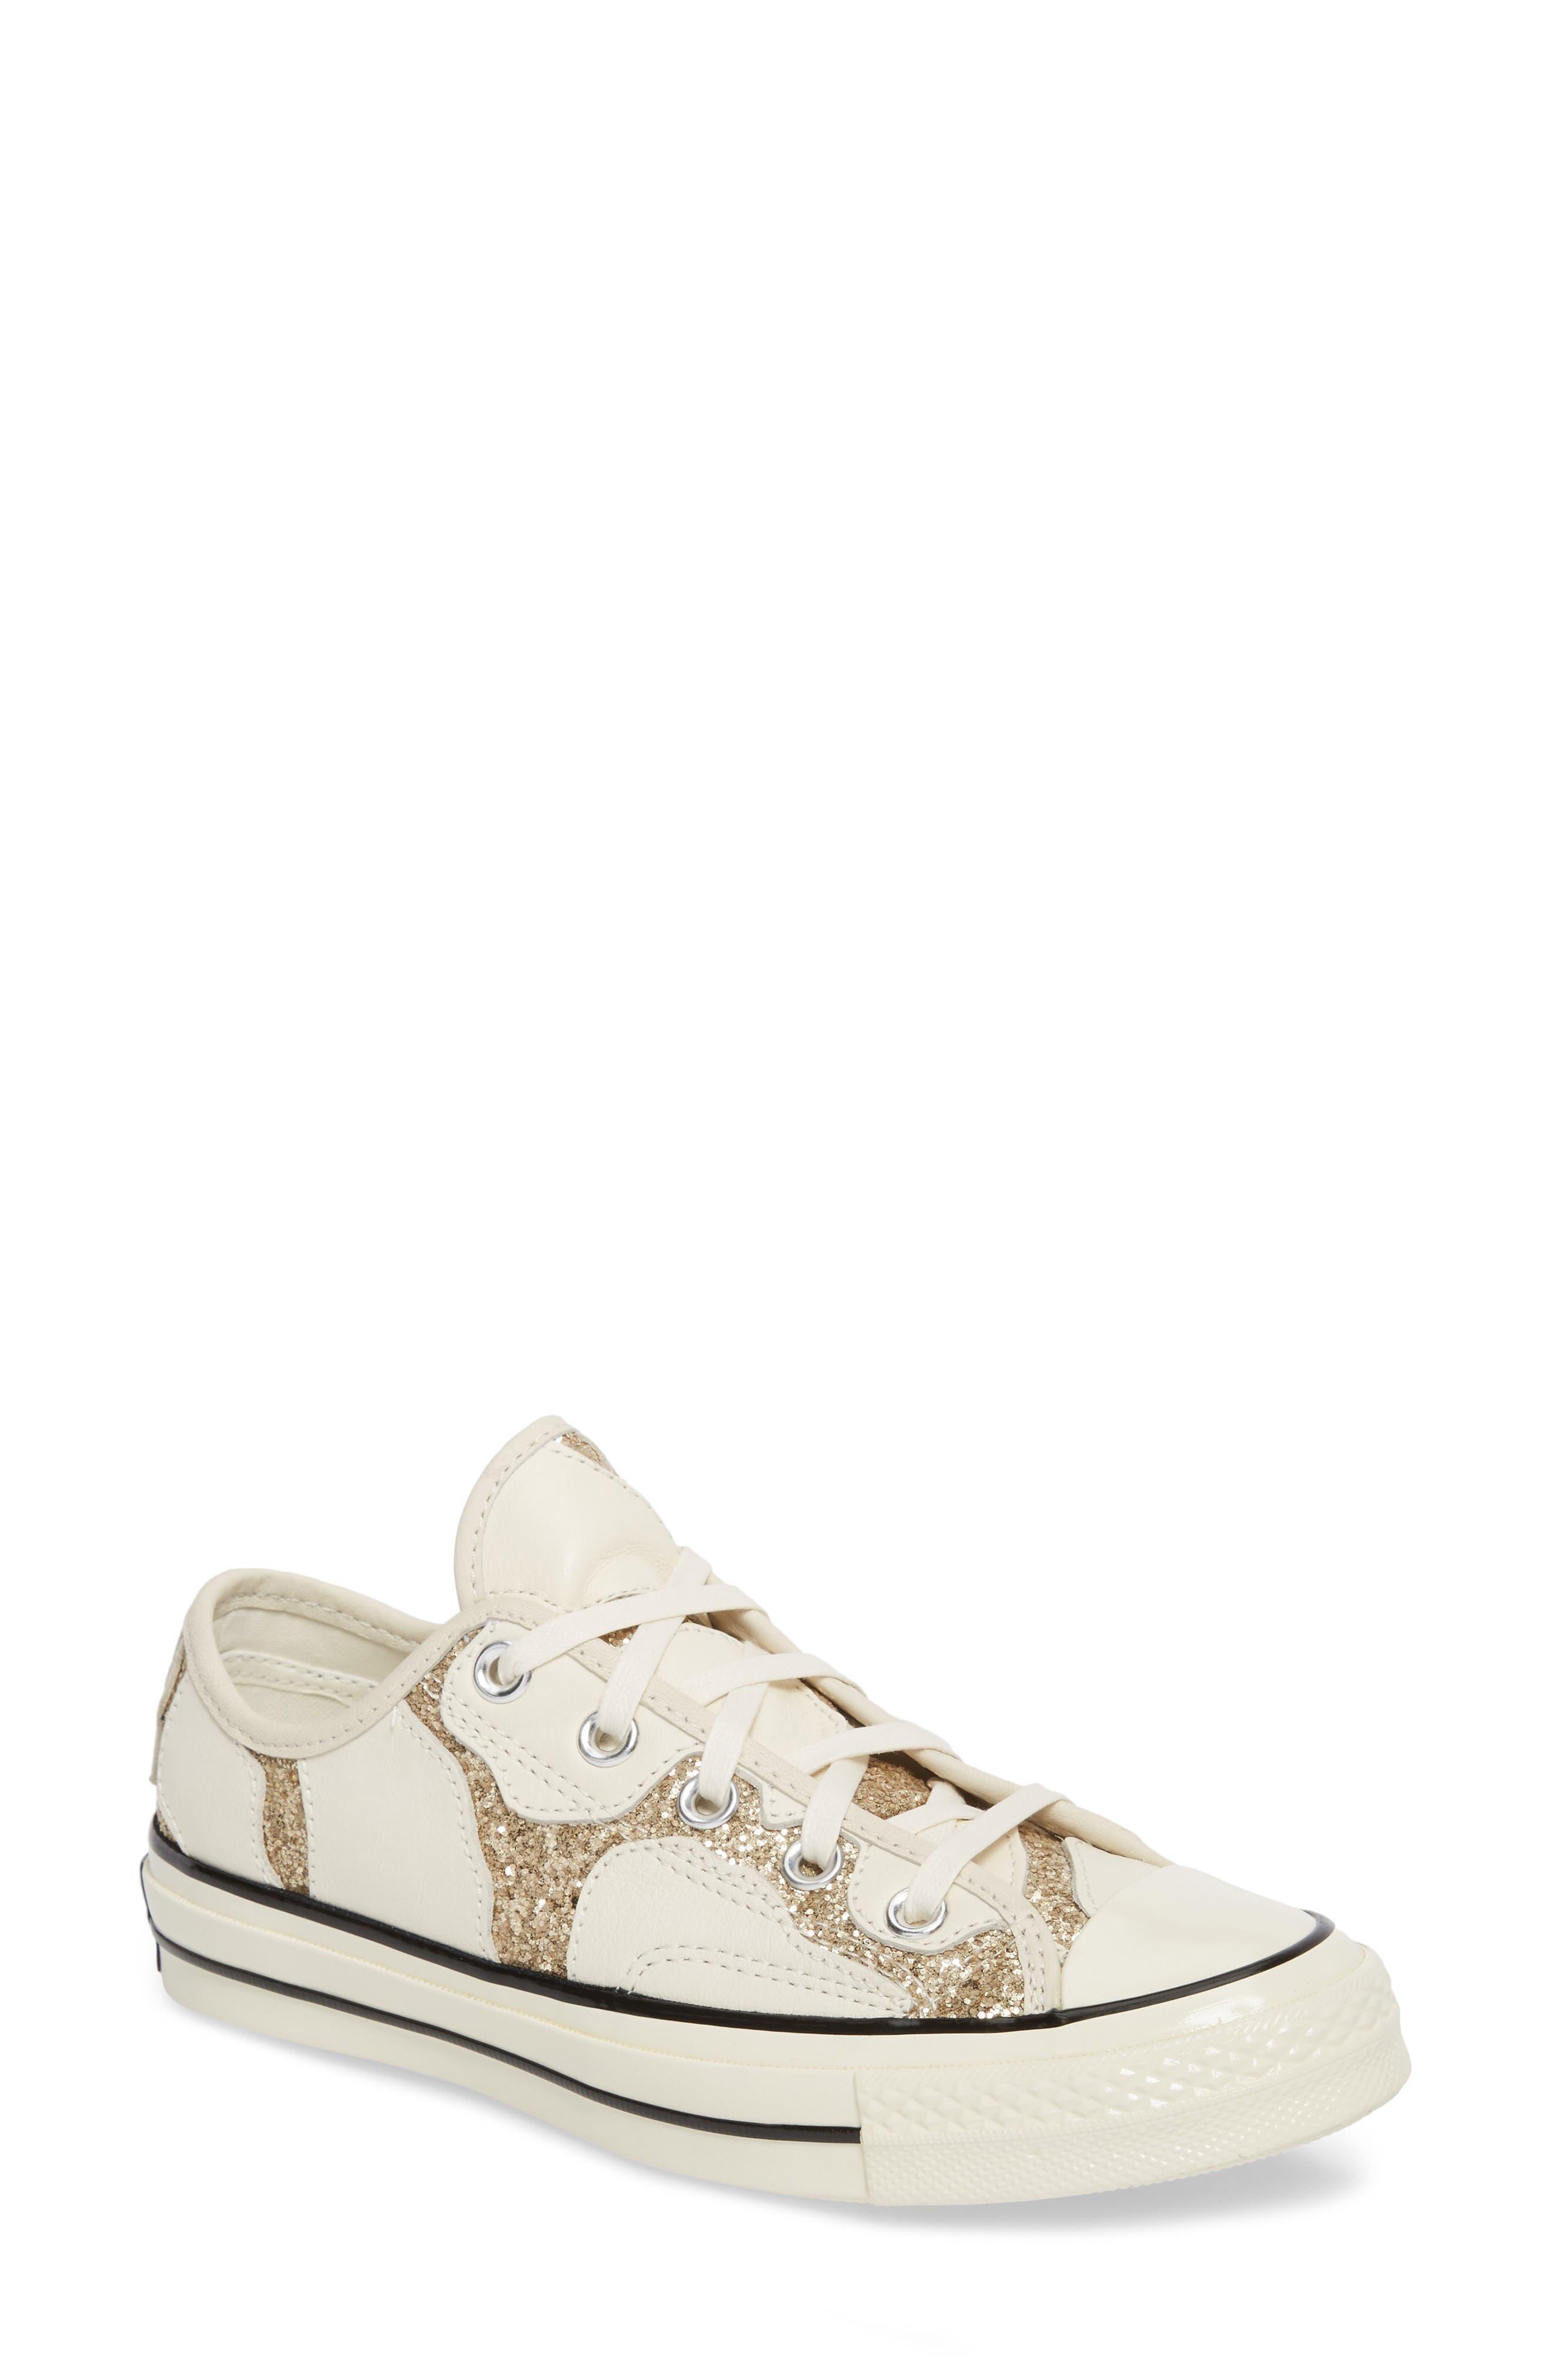 Converse Chuck Taylor® All Star® Animal Glitter Low Top Sneaker (Women)